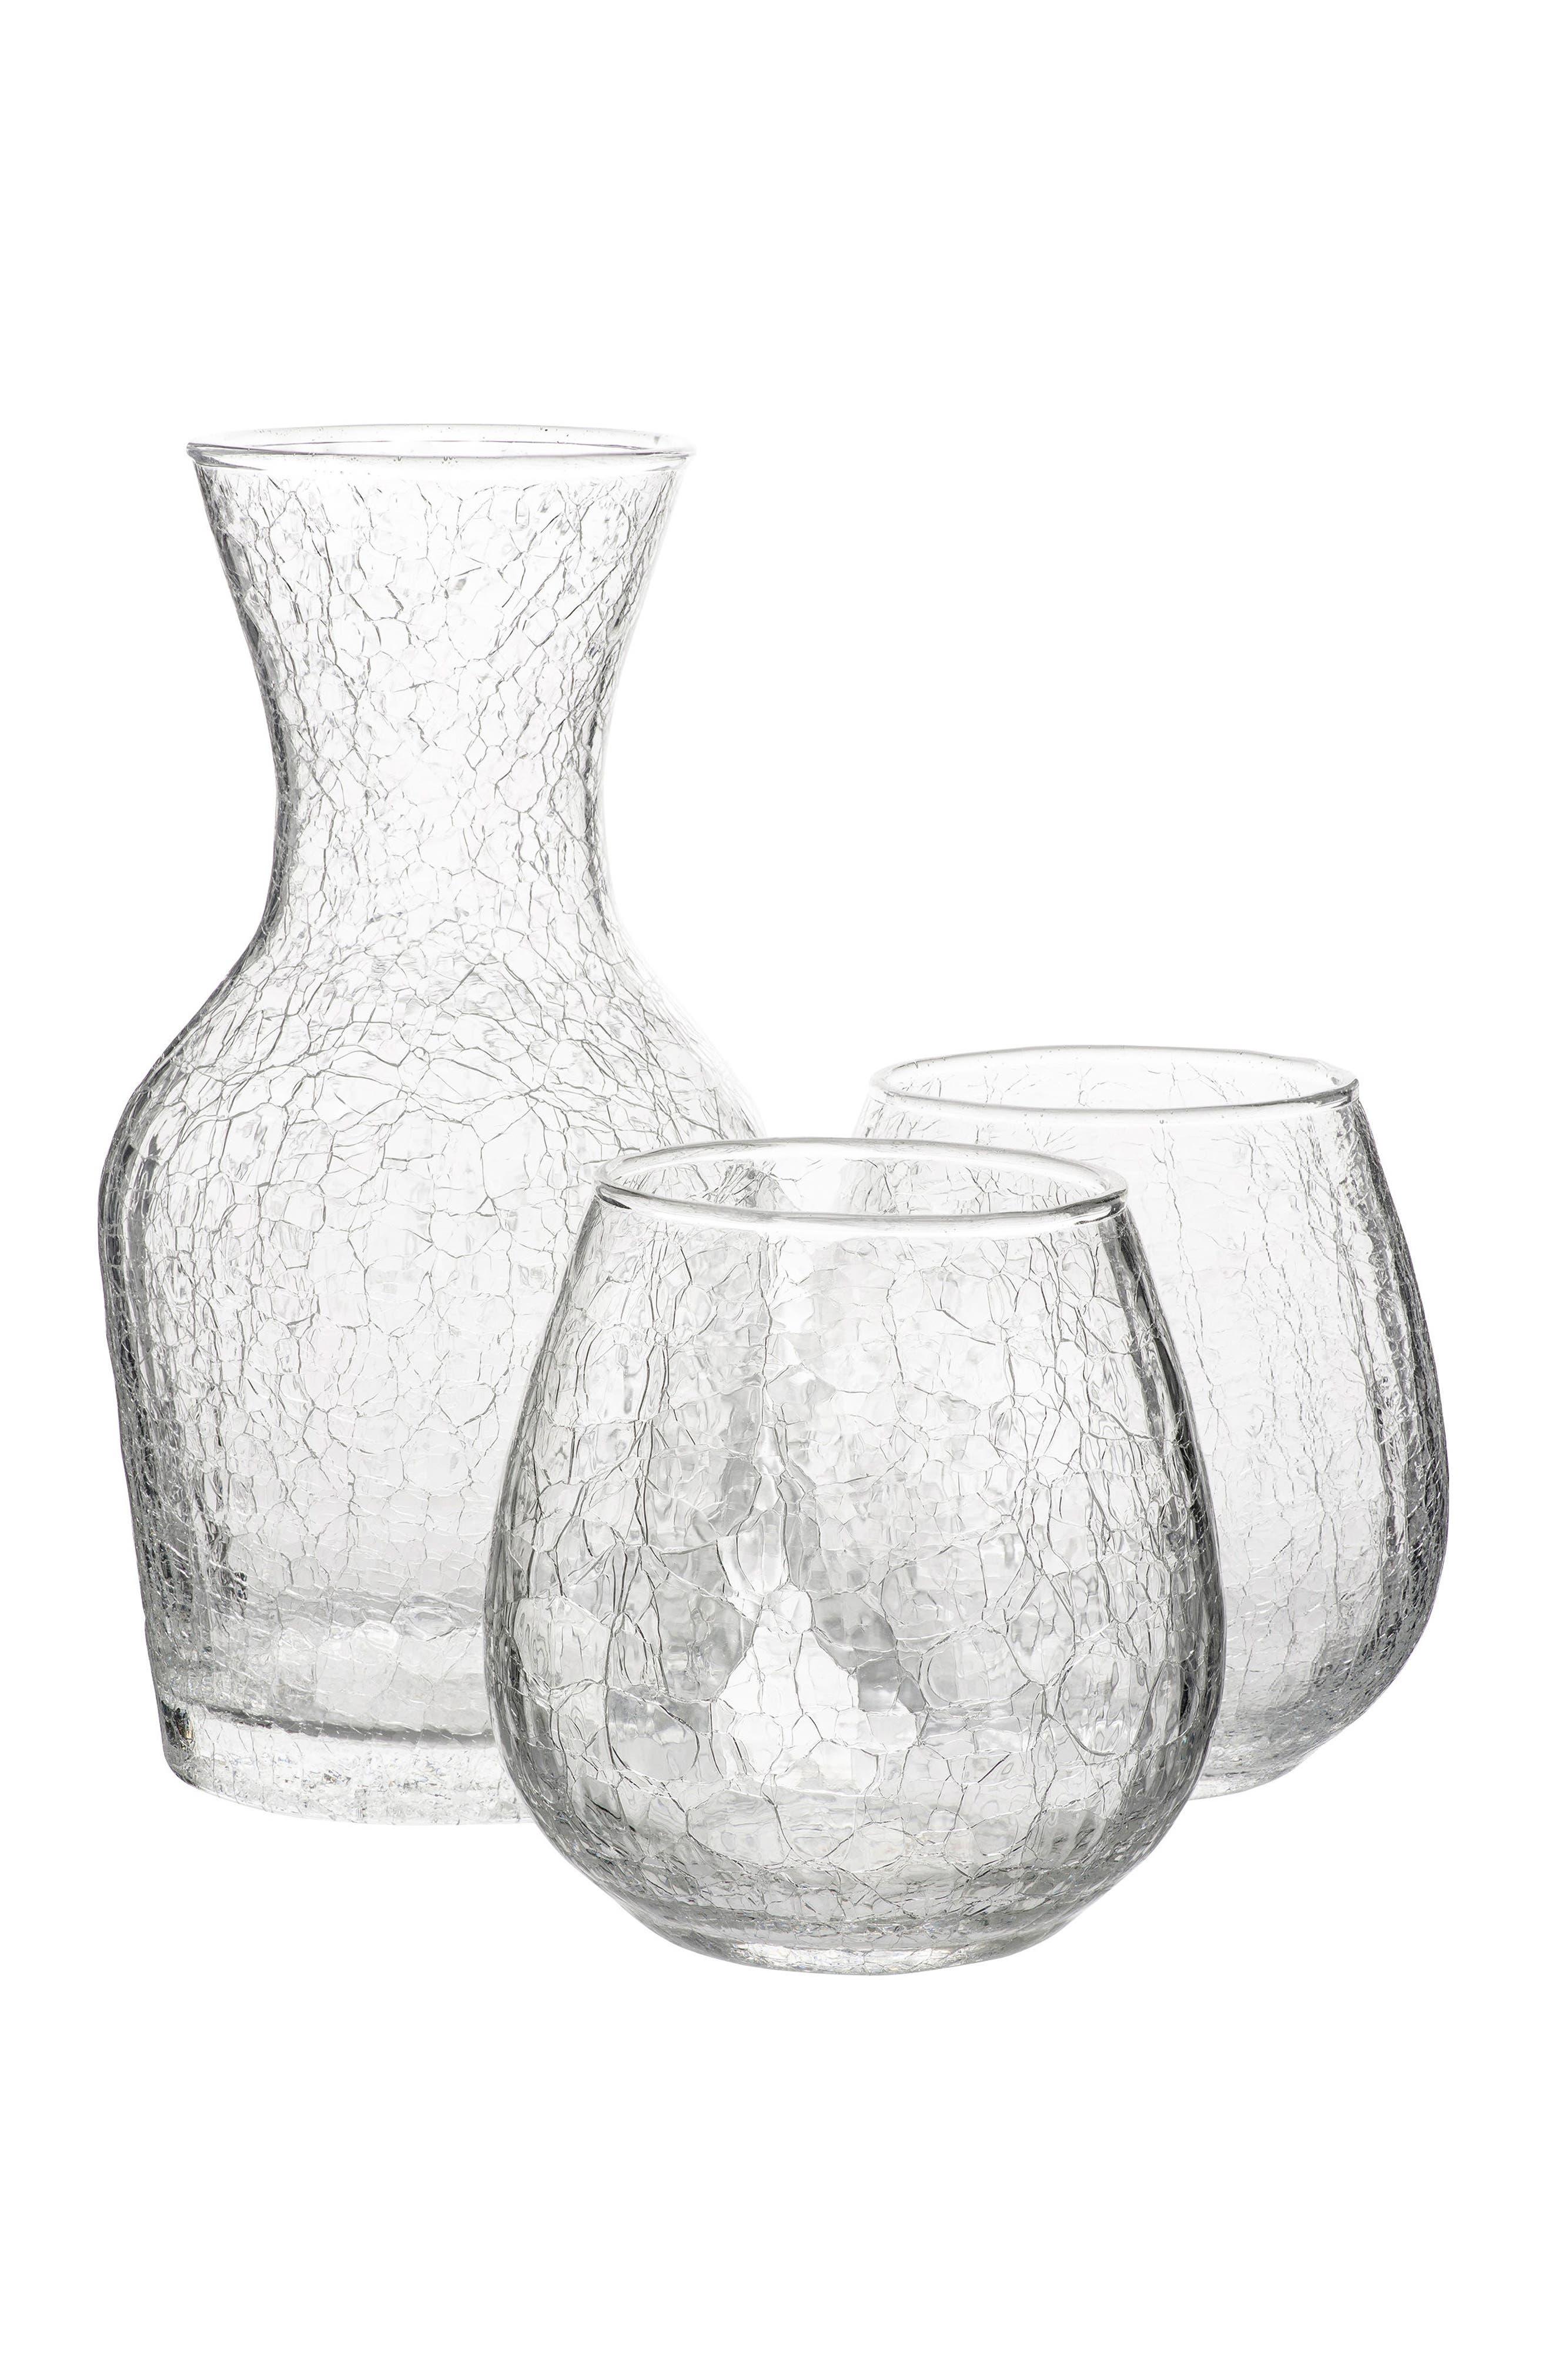 Hugo 3-Piece Carafe & Glasses Set,                             Main thumbnail 1, color,                             100